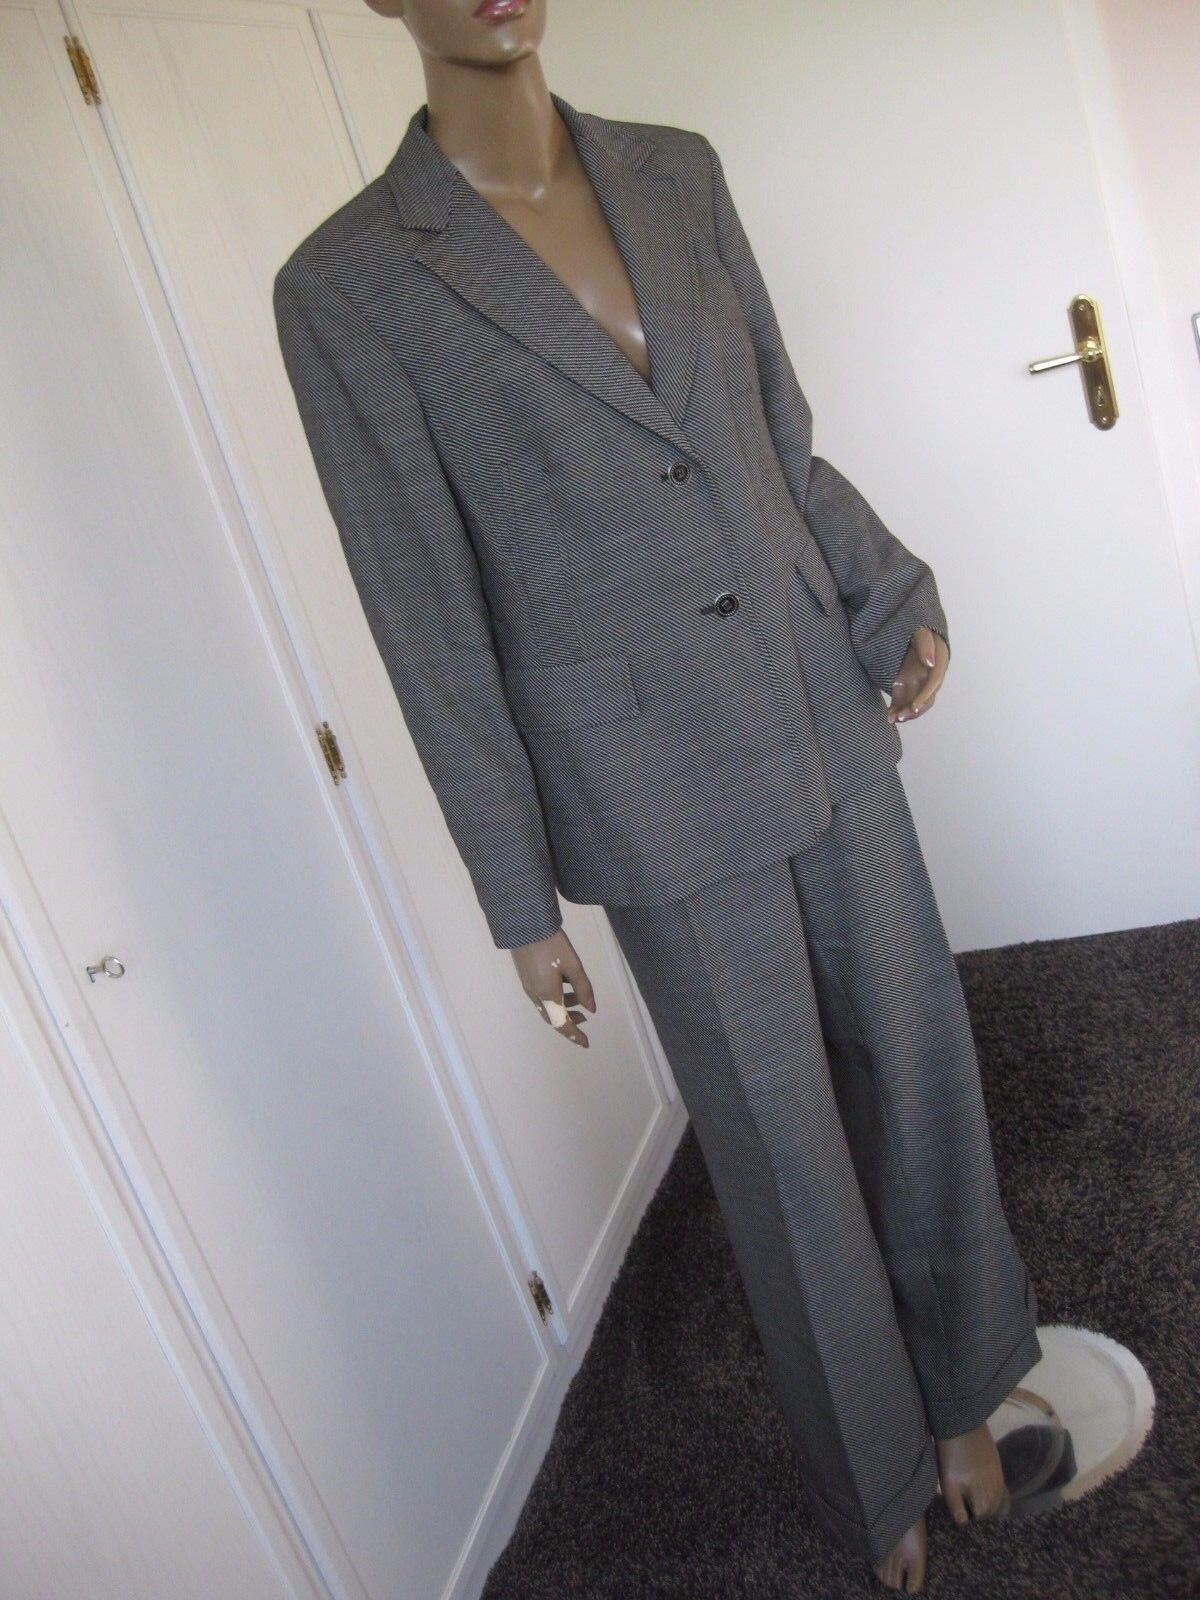 36727d73509 Apanage exclusiver Hosenanzug 44 42 black white Blazer +Hose Wolle. NWT  Free People Bella Lace Shift Dress